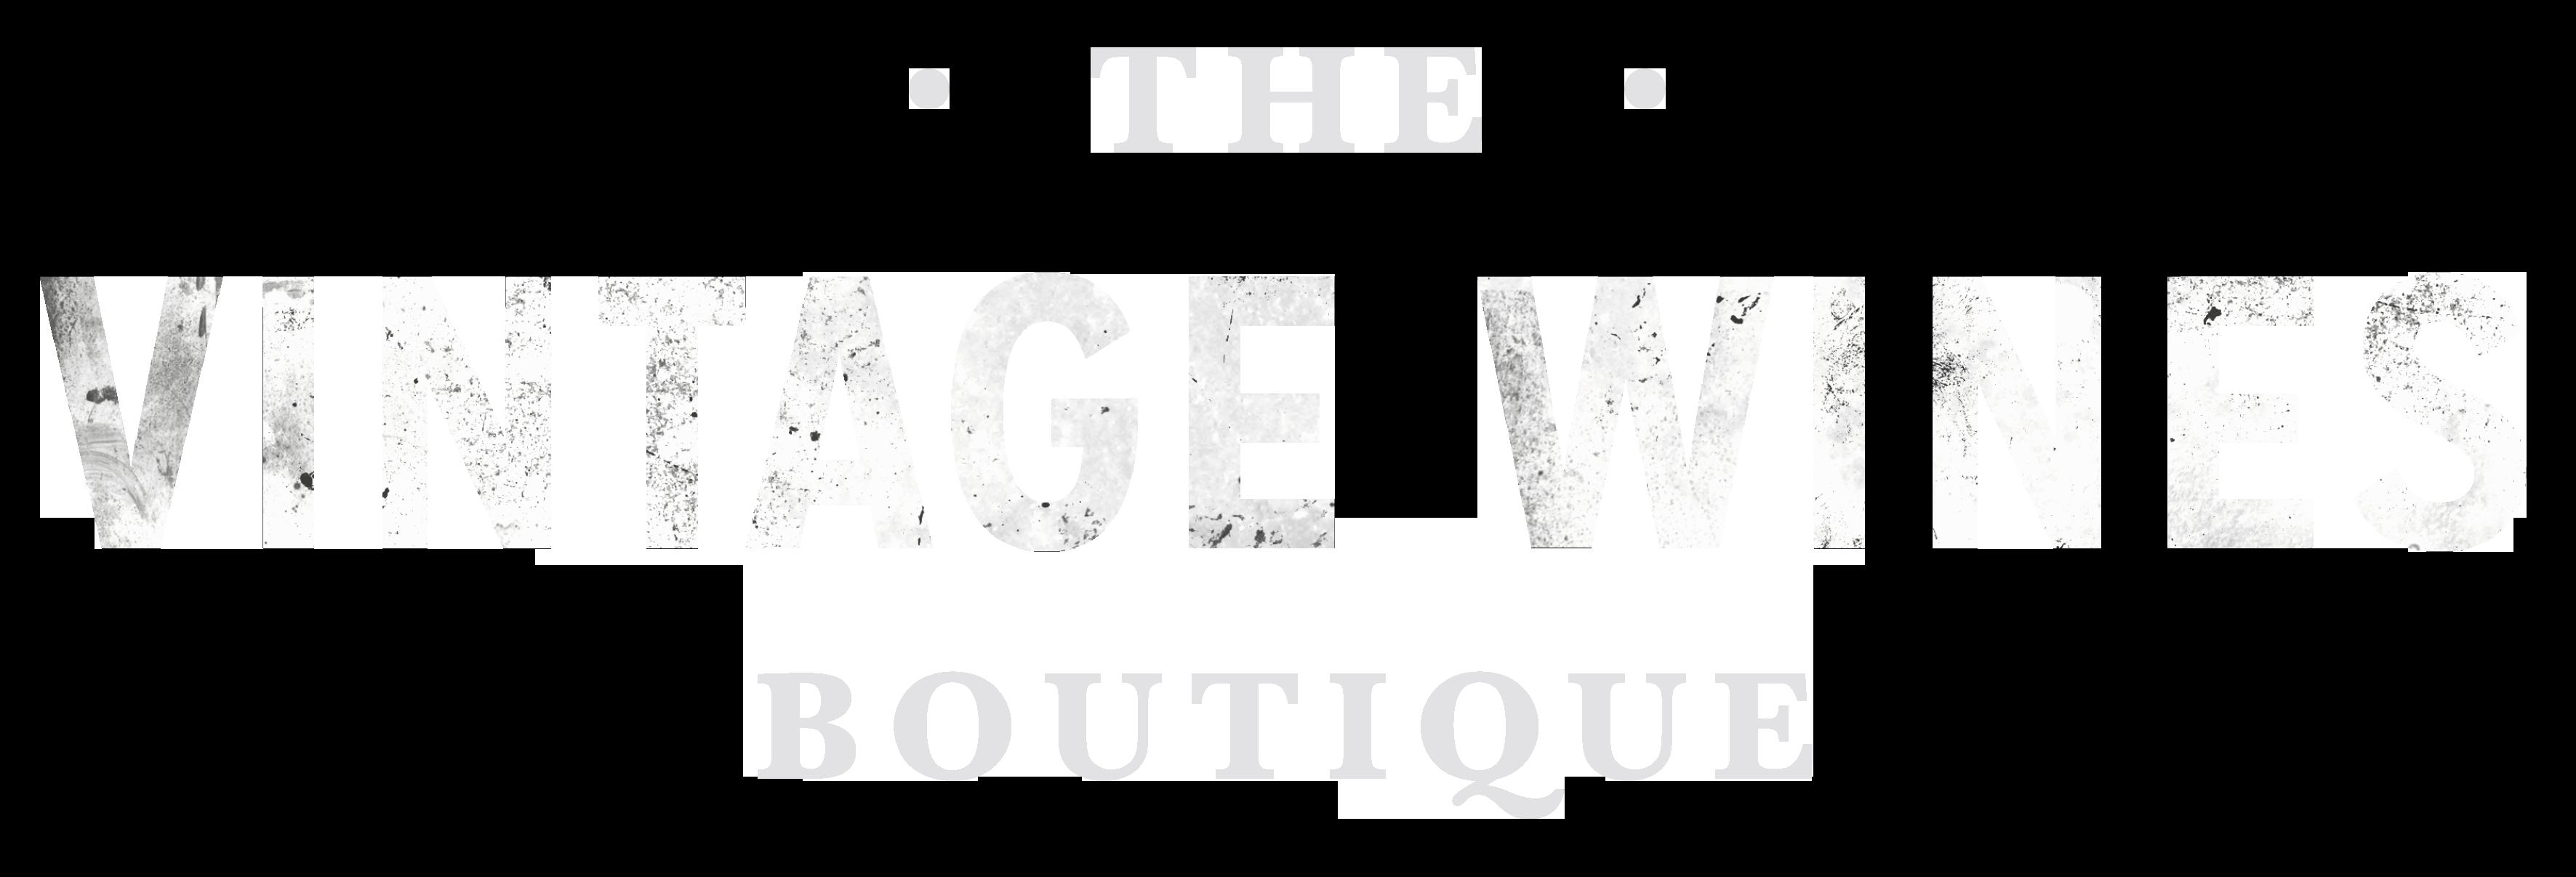 The Vintage Wines Boutique